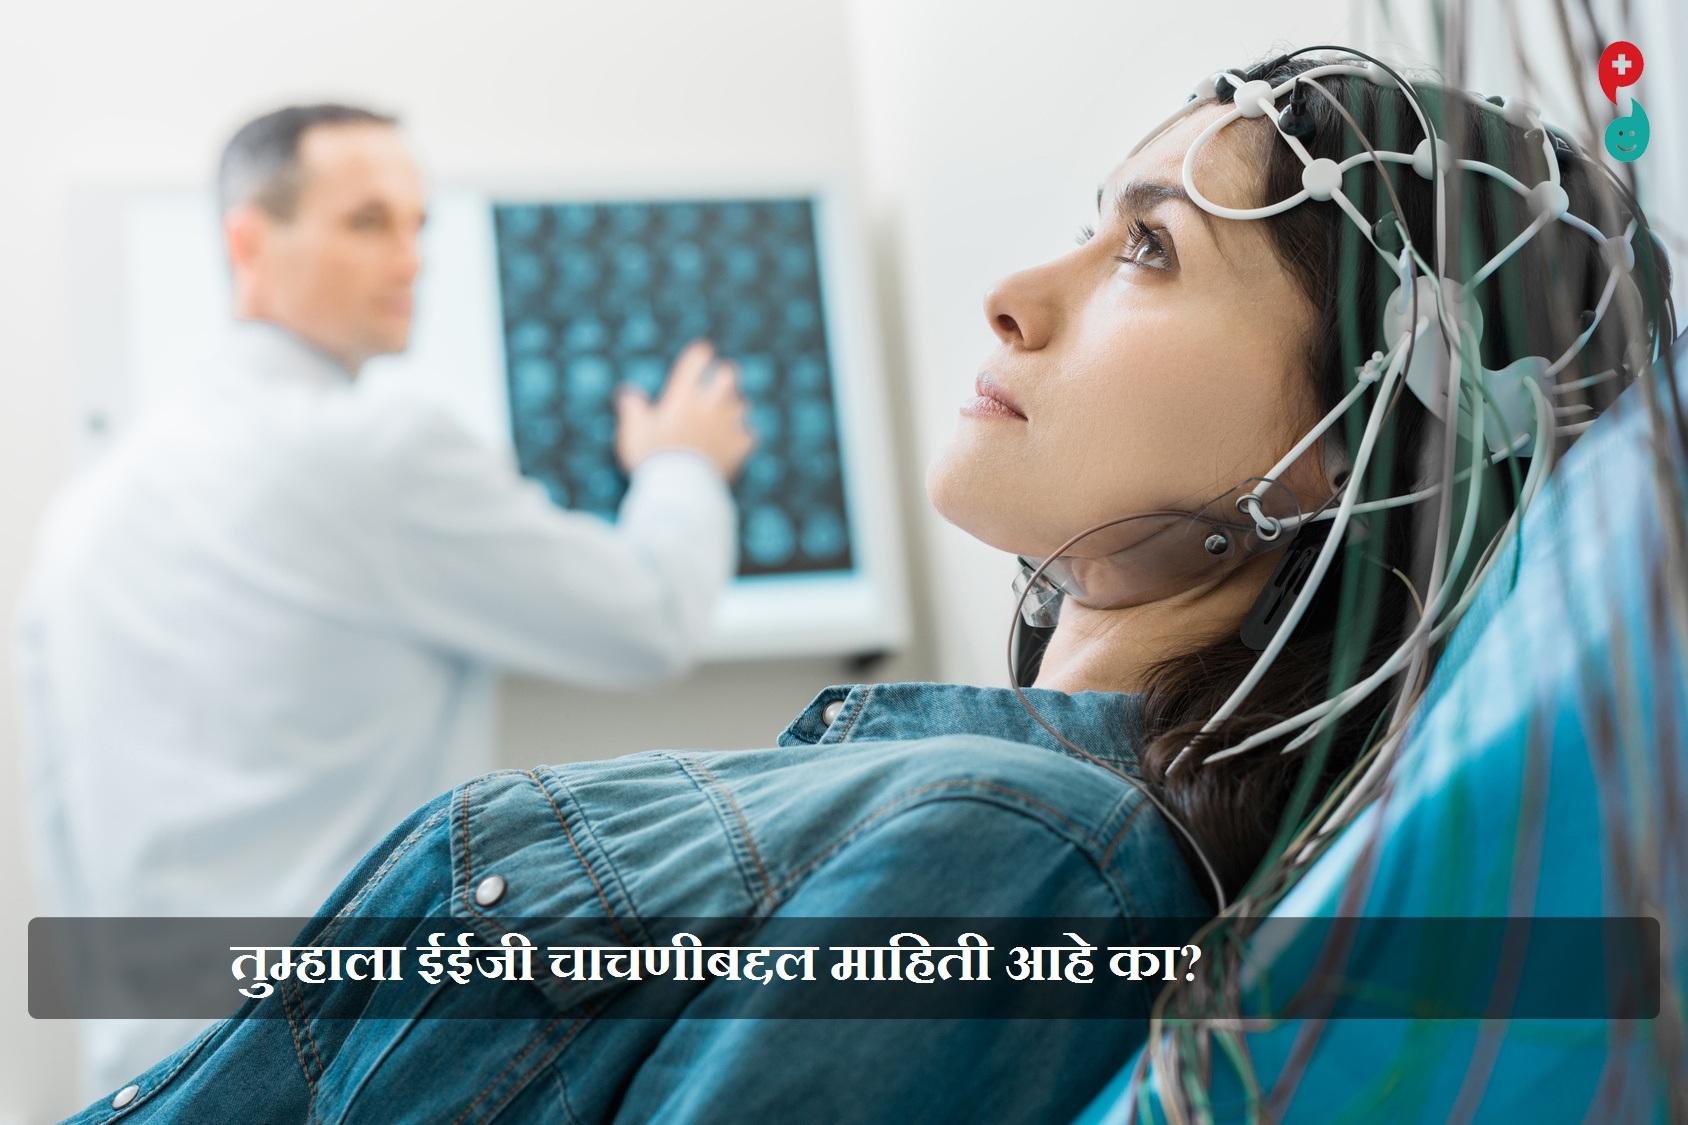 ईईजी (इलेक्ट्रोएन्सेफॅलोग्राम) चाचणी